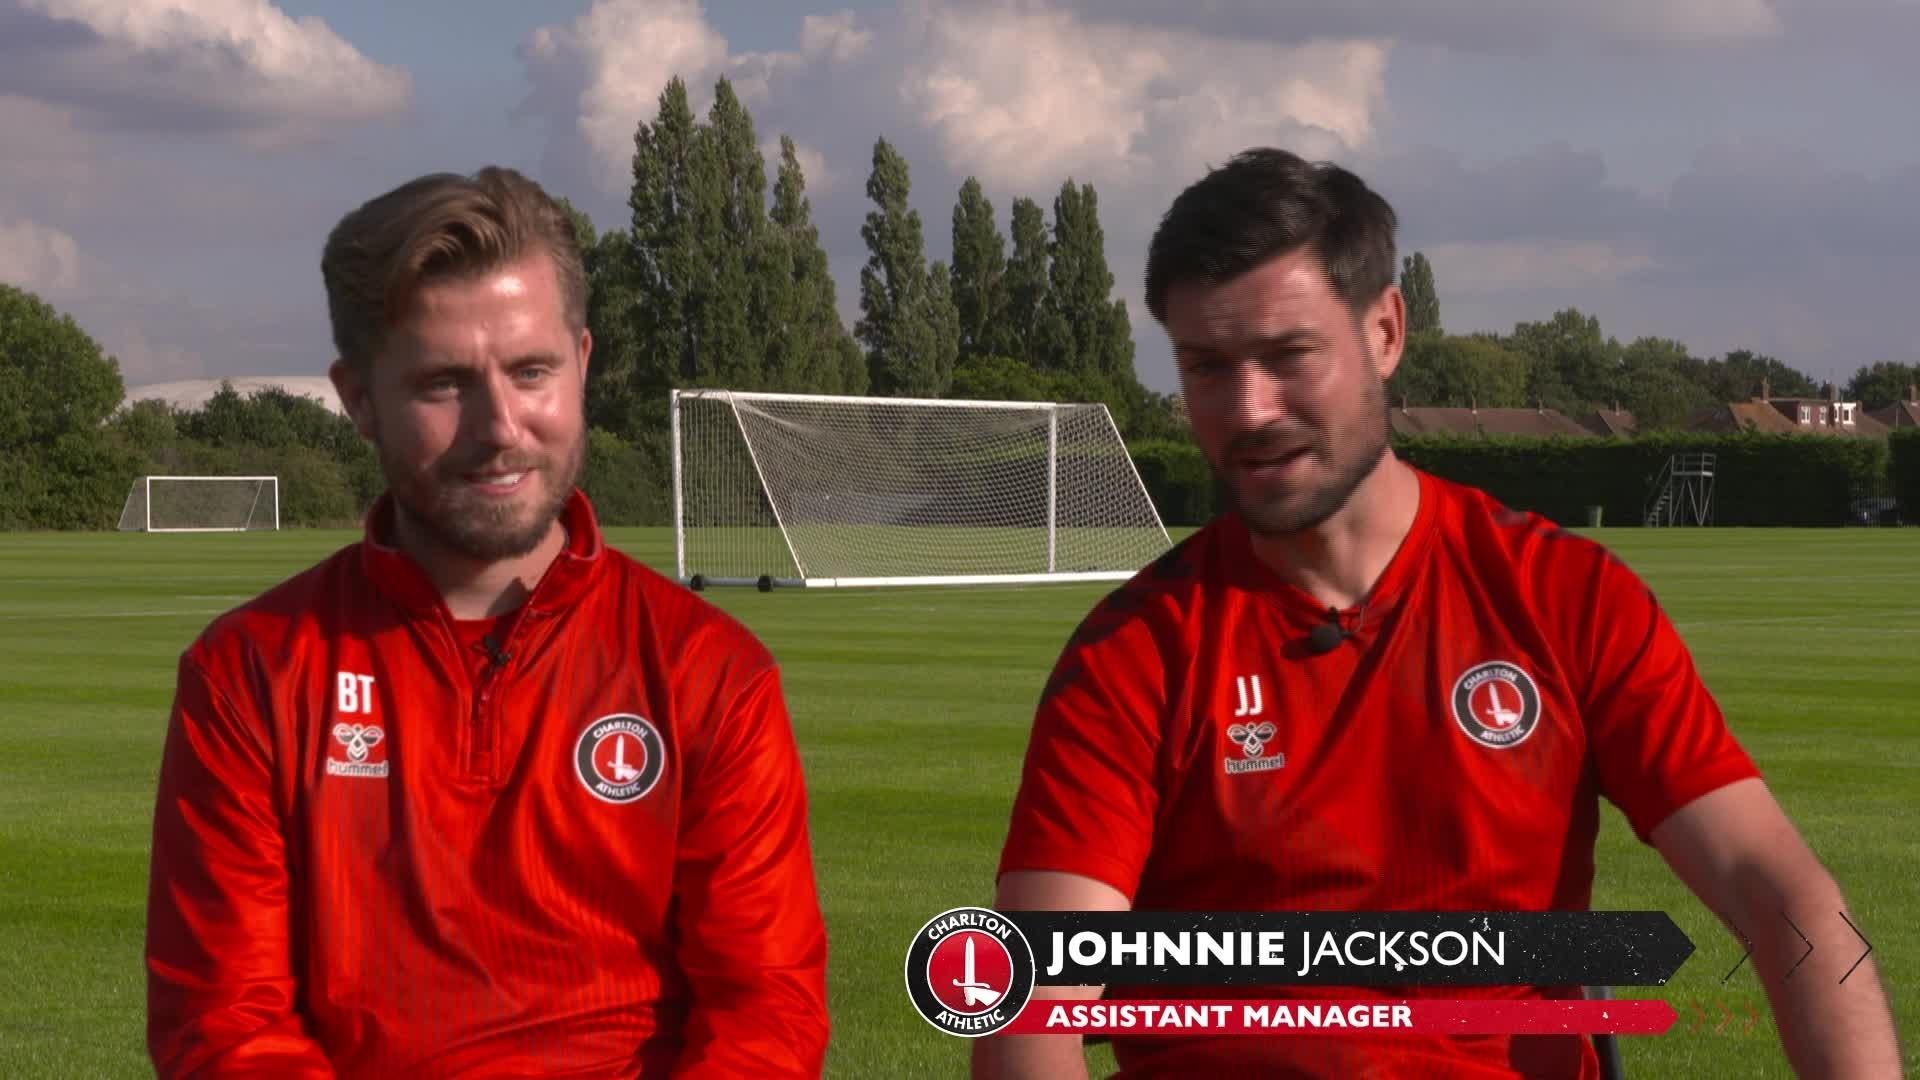 Jackson and Talbot look ahead to the London Marathon (September 2021)